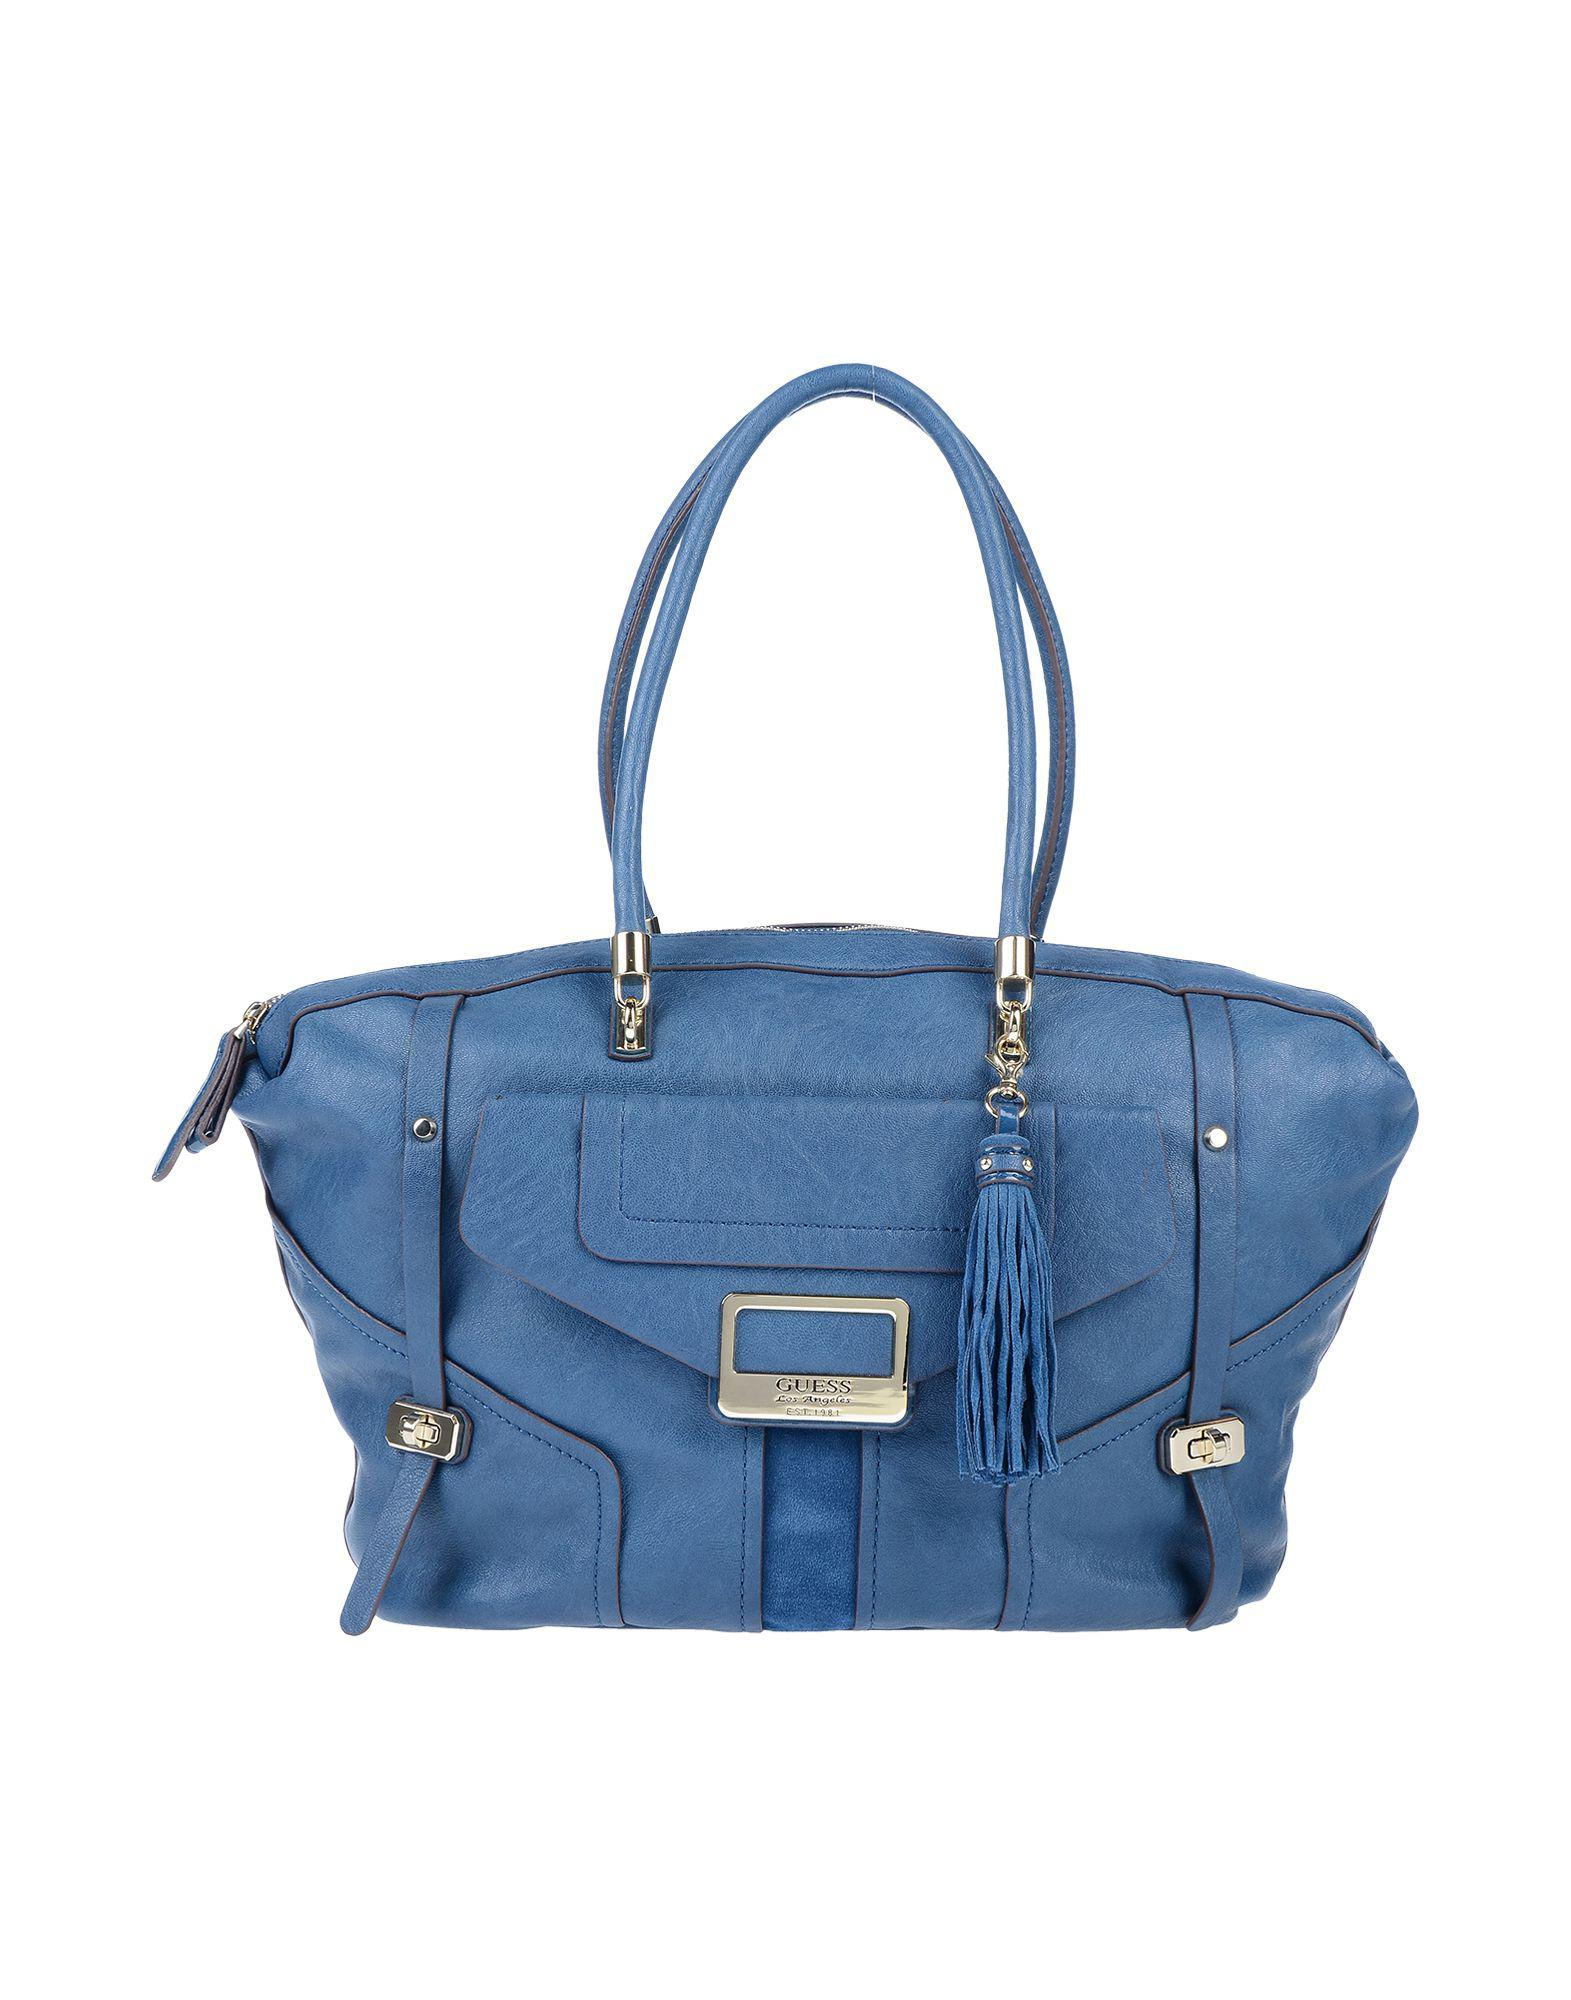 203dd5bdf392 Guess - Blue Handbag - Lyst. View fullscreen